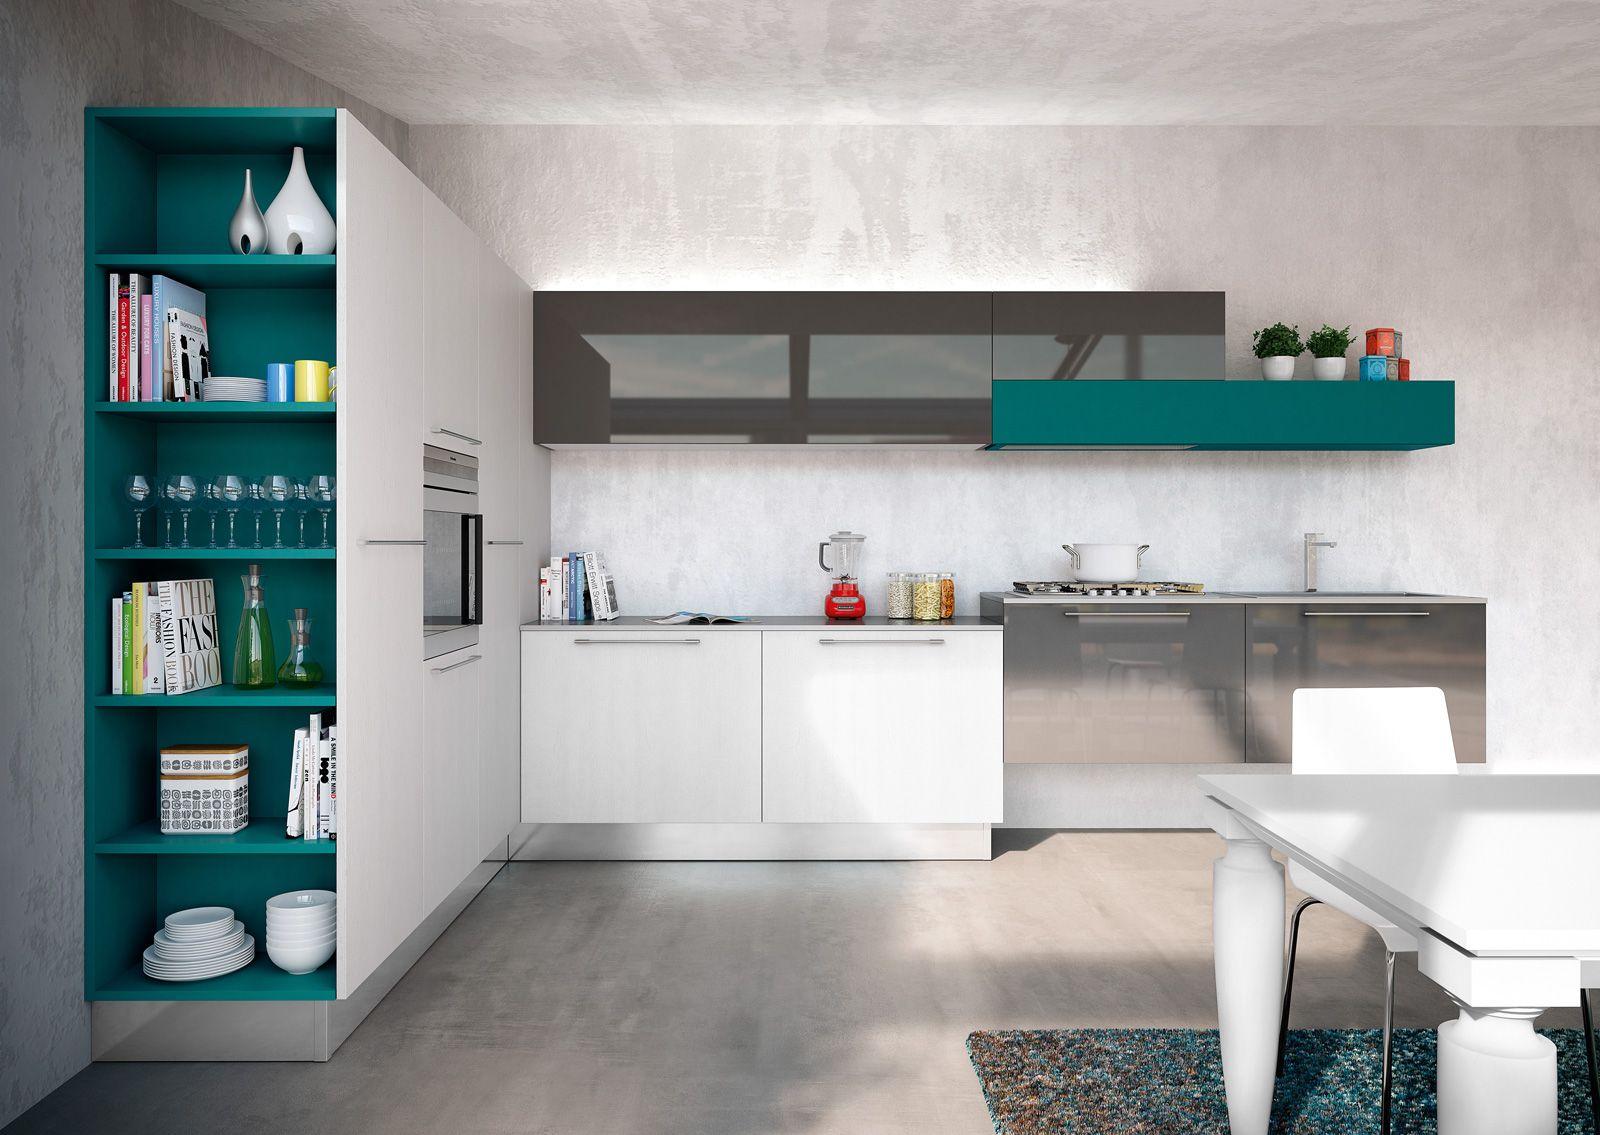 Cucine Con Elementi Colorati Mensole Vani A Giorno Profili Cose Di Casa Cucine Moderne Cucina Moderna Ristrutturazione Cucina